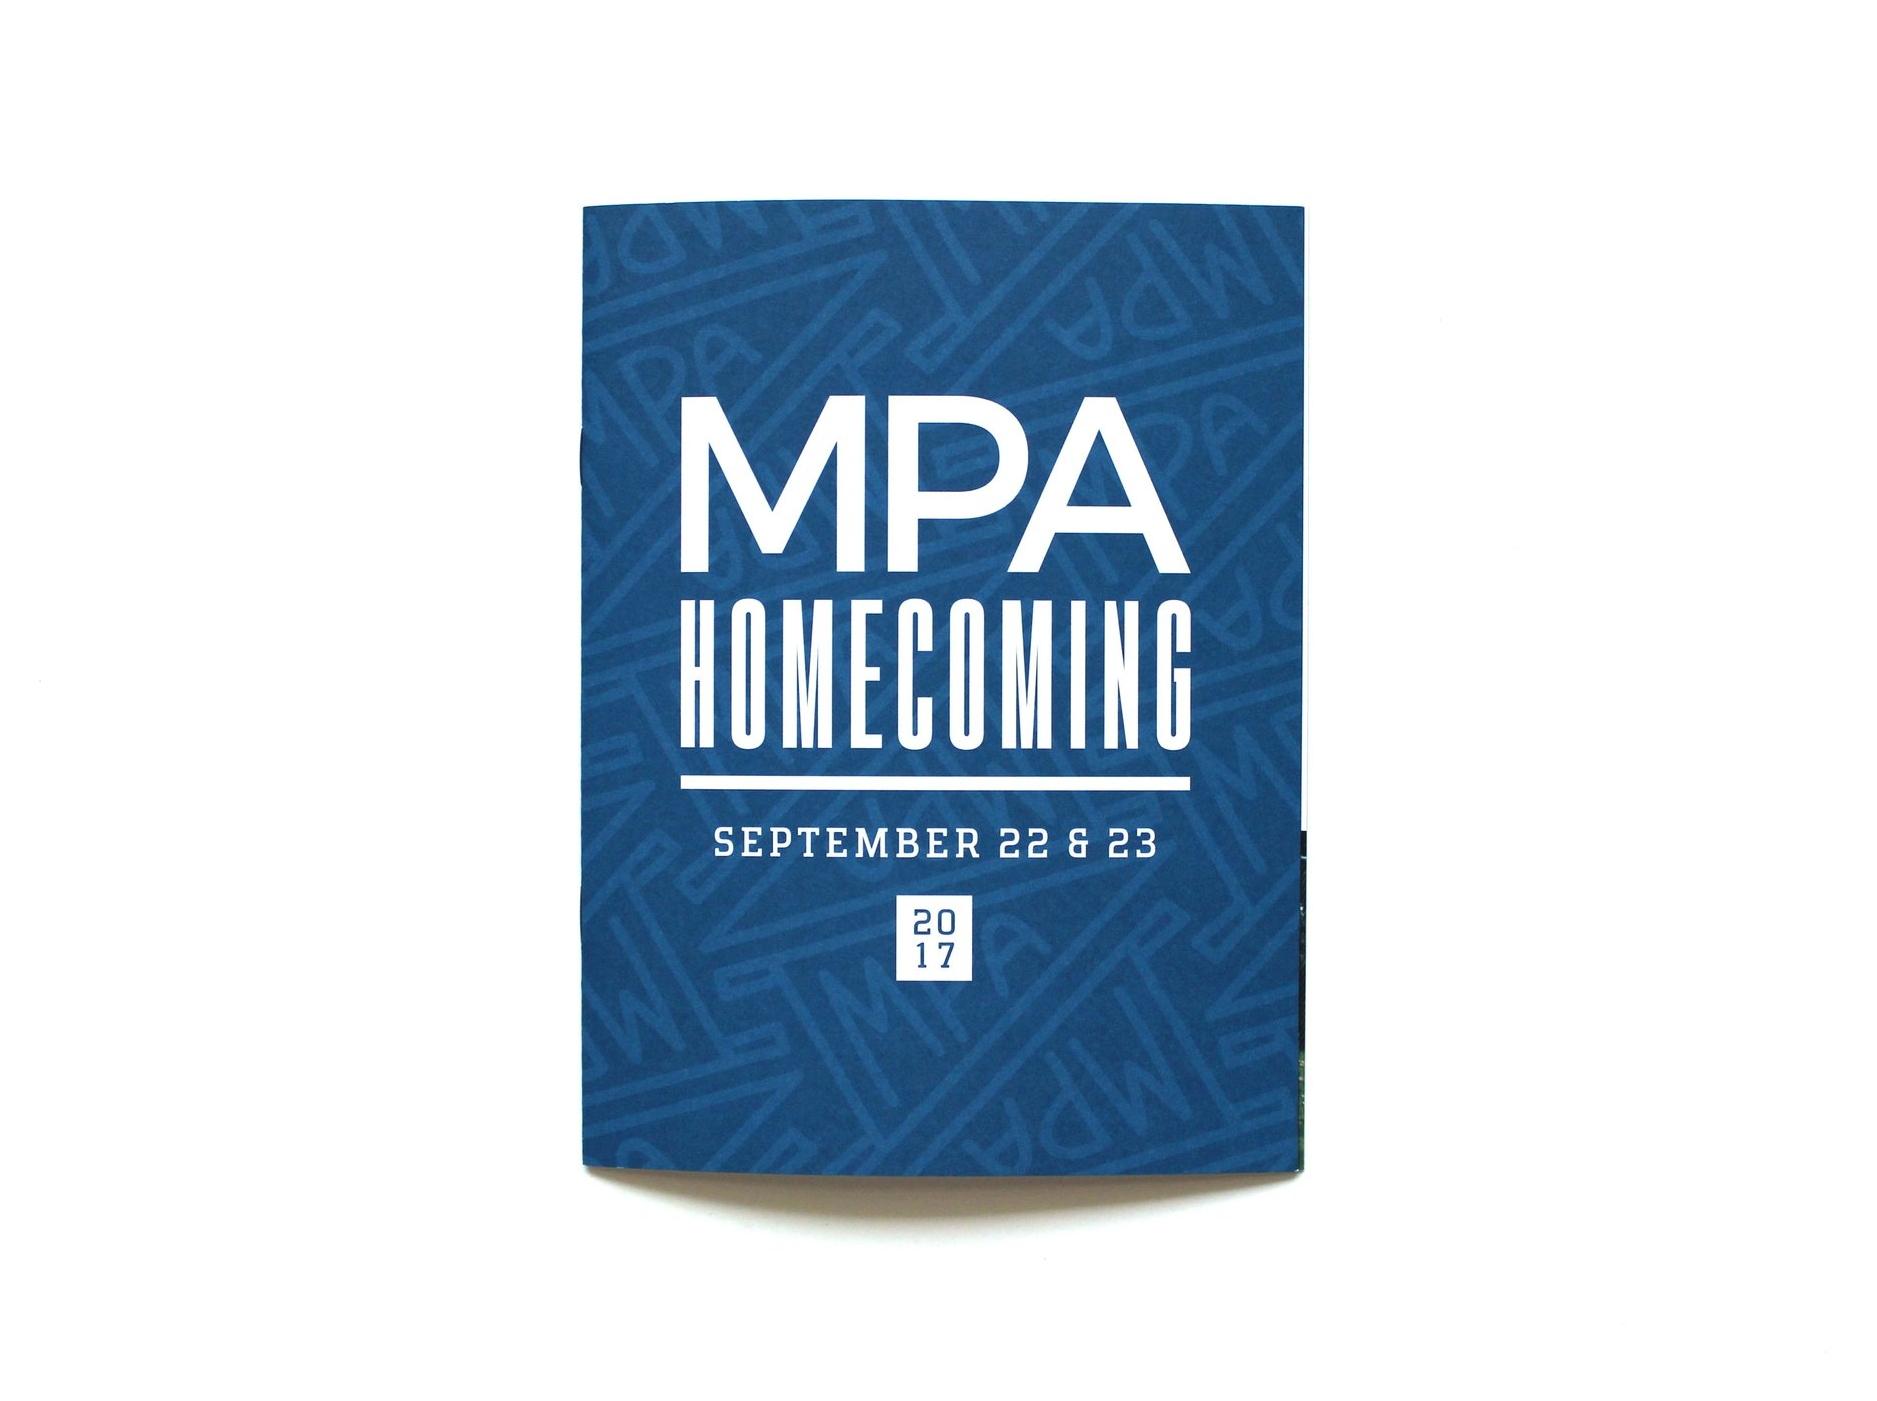 Homecoming2017-S.jpg